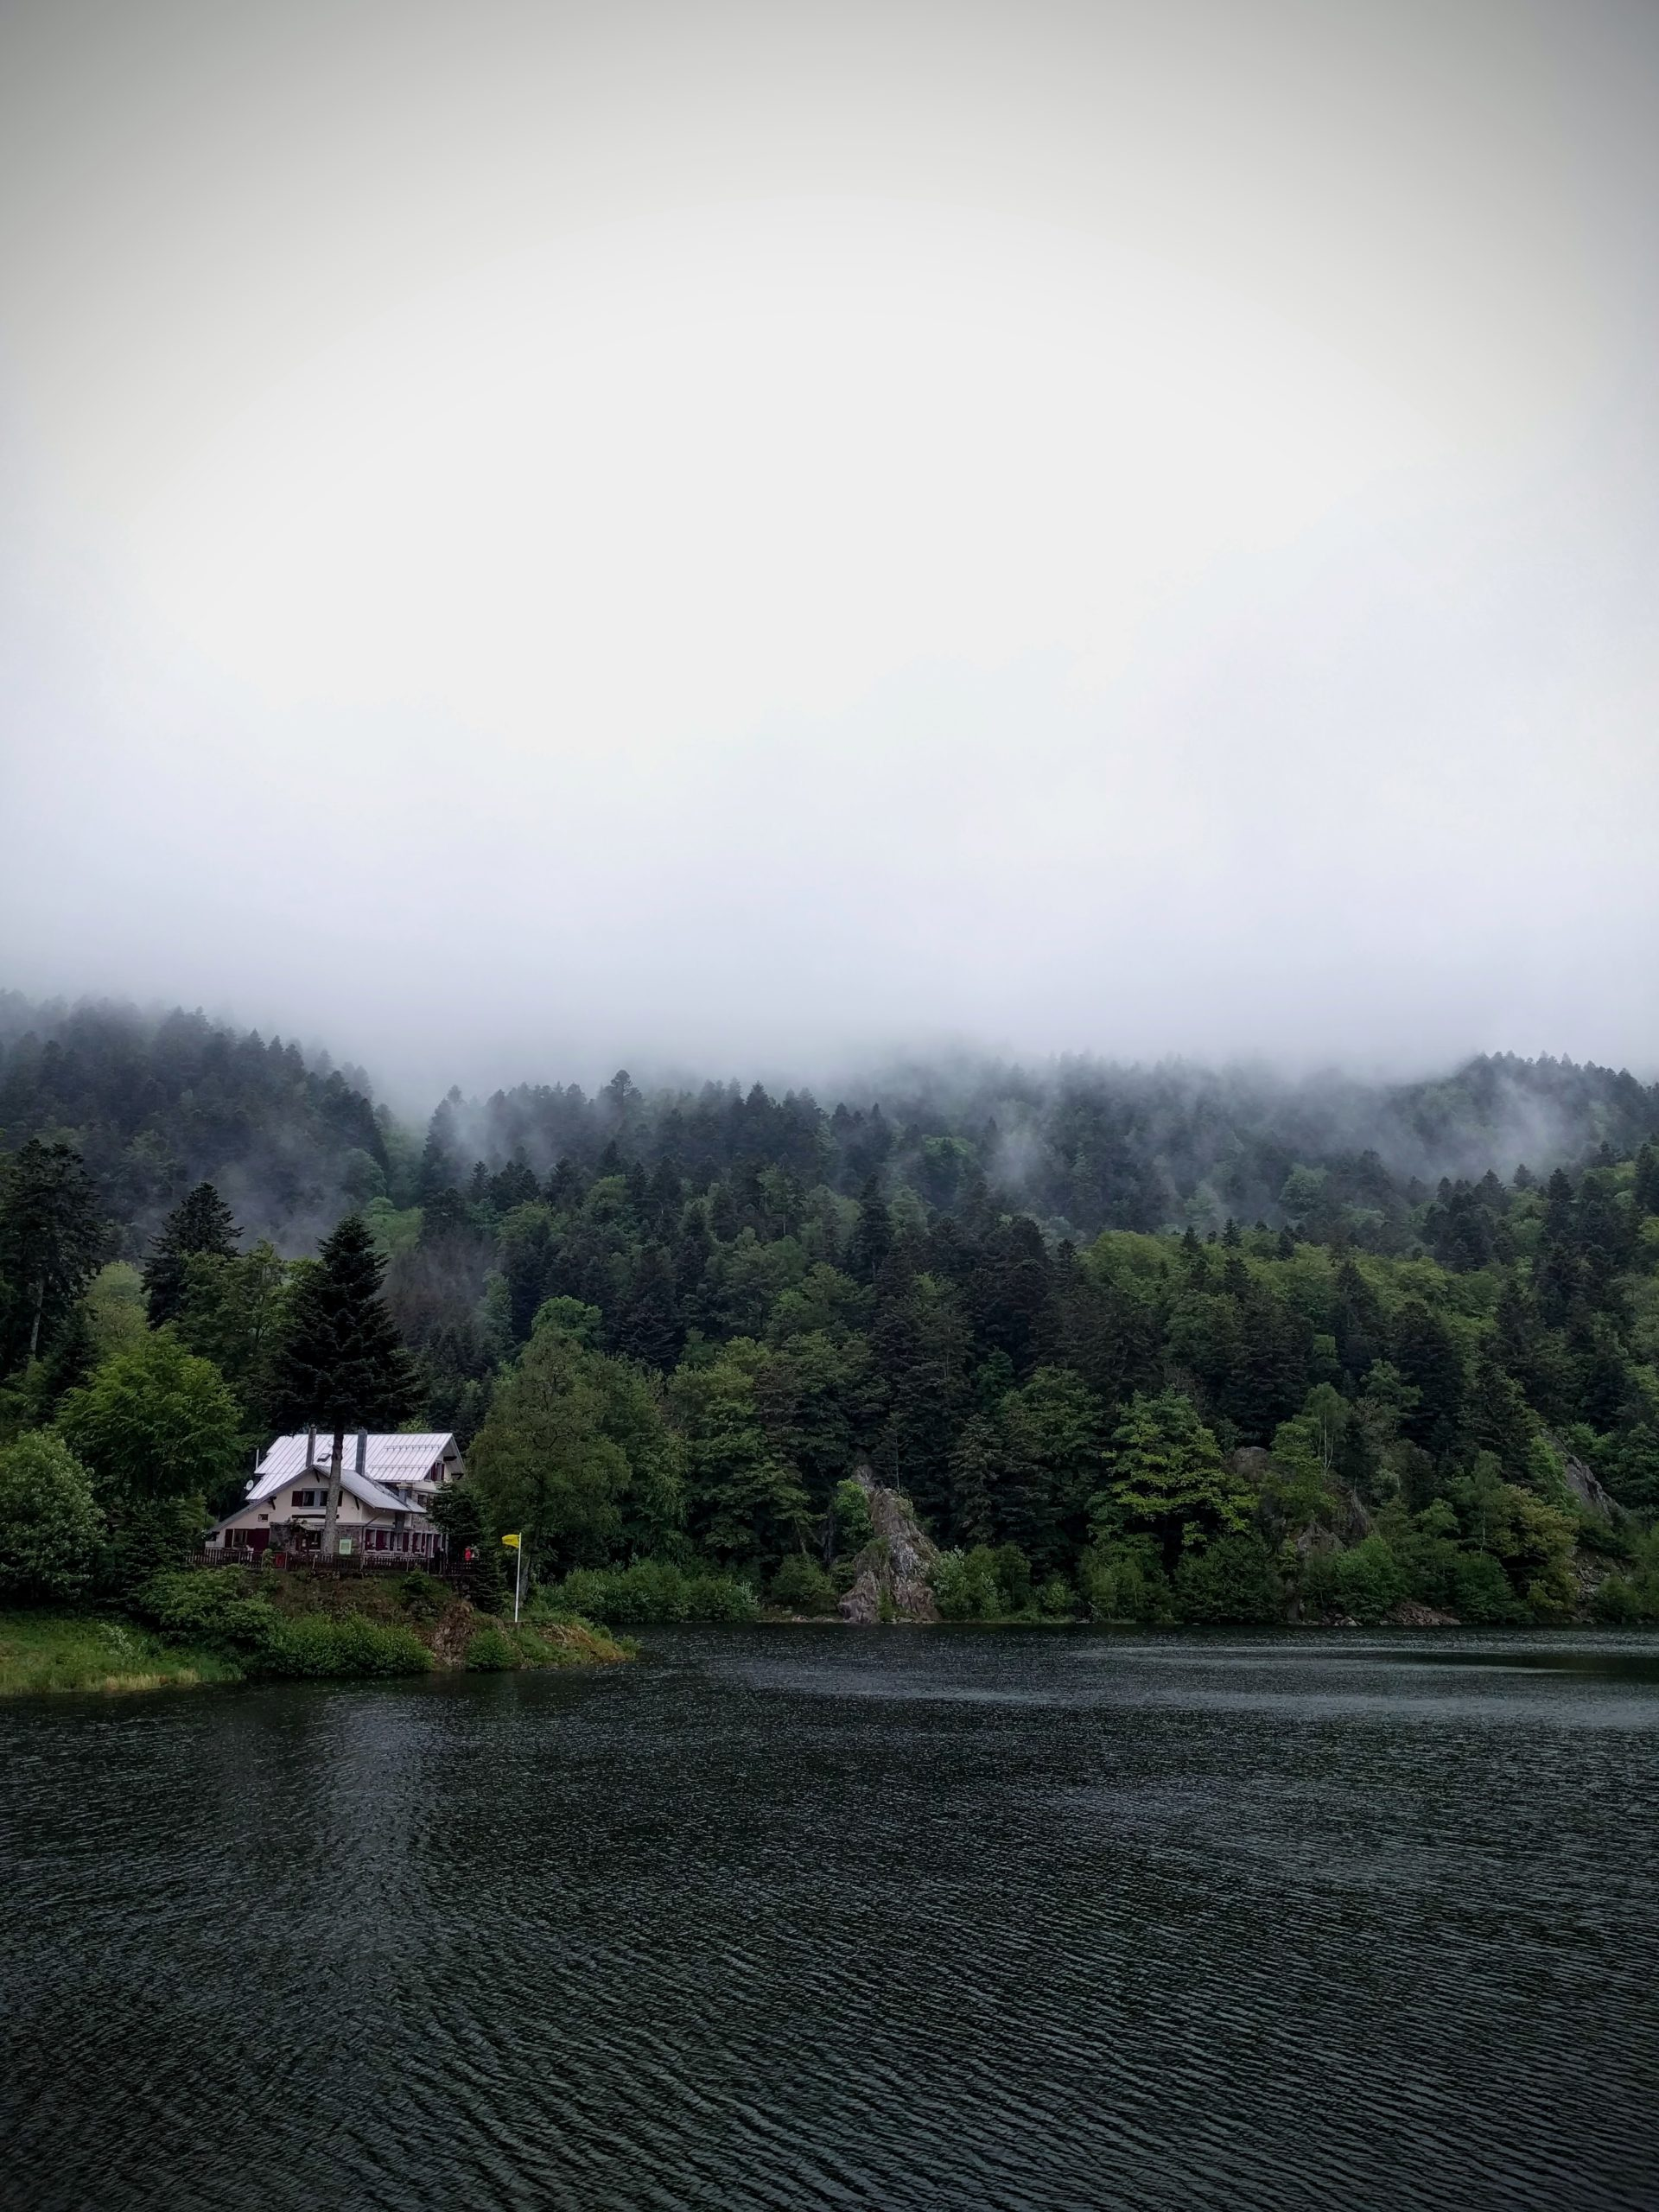 L'auberge-refuge du Neuweiher entouré de forêts